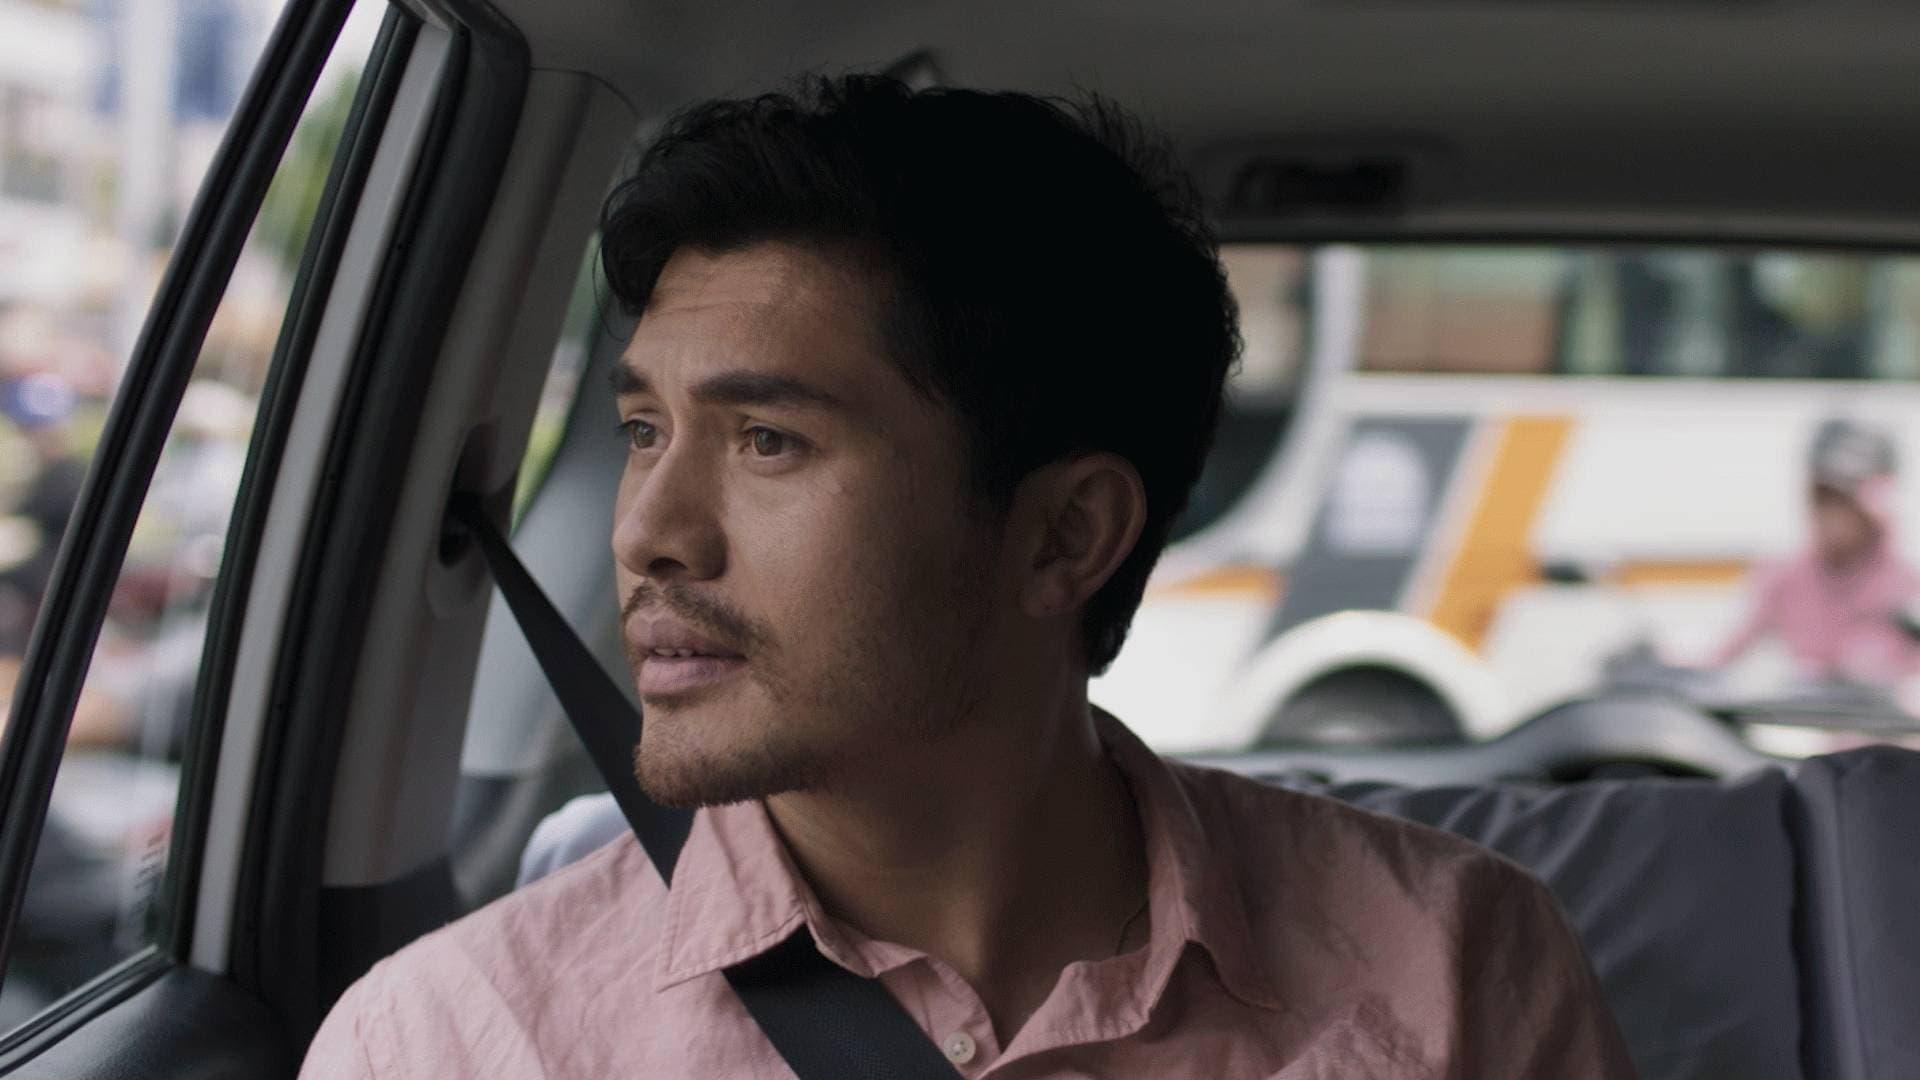 Watch Monsoon (2020) Full Movie Online Free | Stream Free Movies & TV Shows